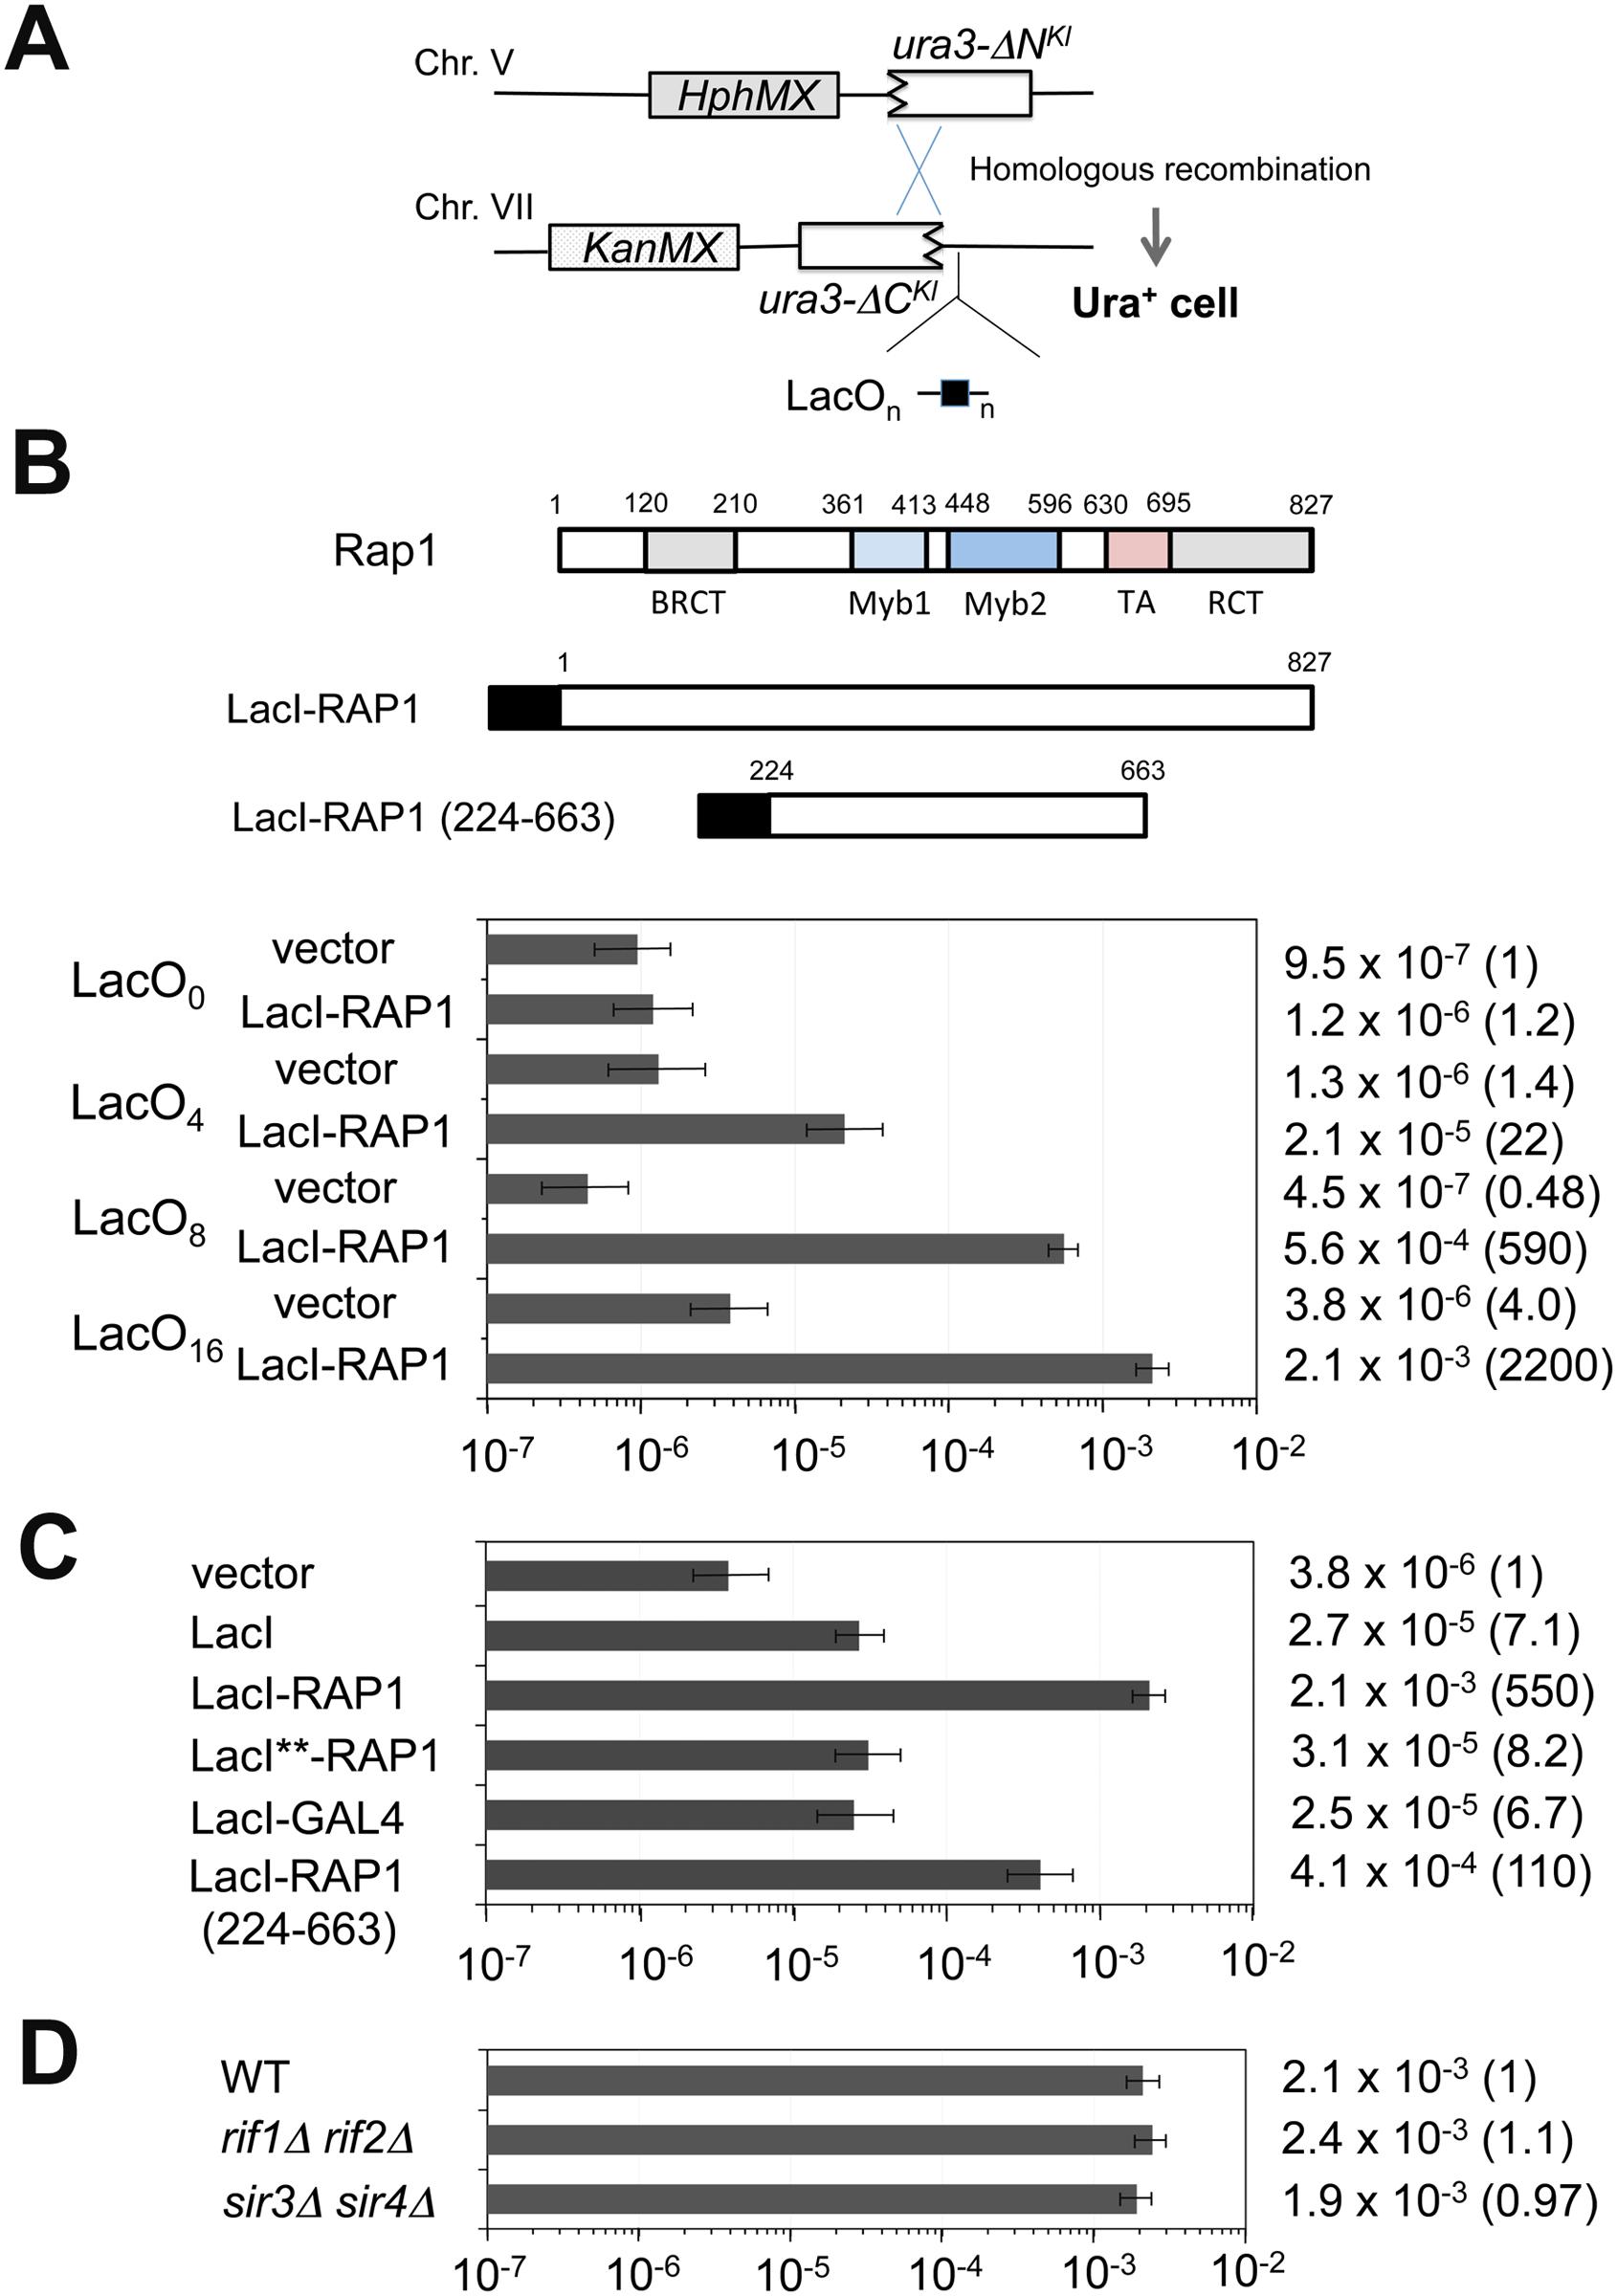 Effect of Rap1 tethering on homologous recombination between the <i>ura3-ΔN</i><sup><i>Kl</i></sup> gene and the <i>ura3-ΔC</i><sup><i>Kl</i></sup> gene.